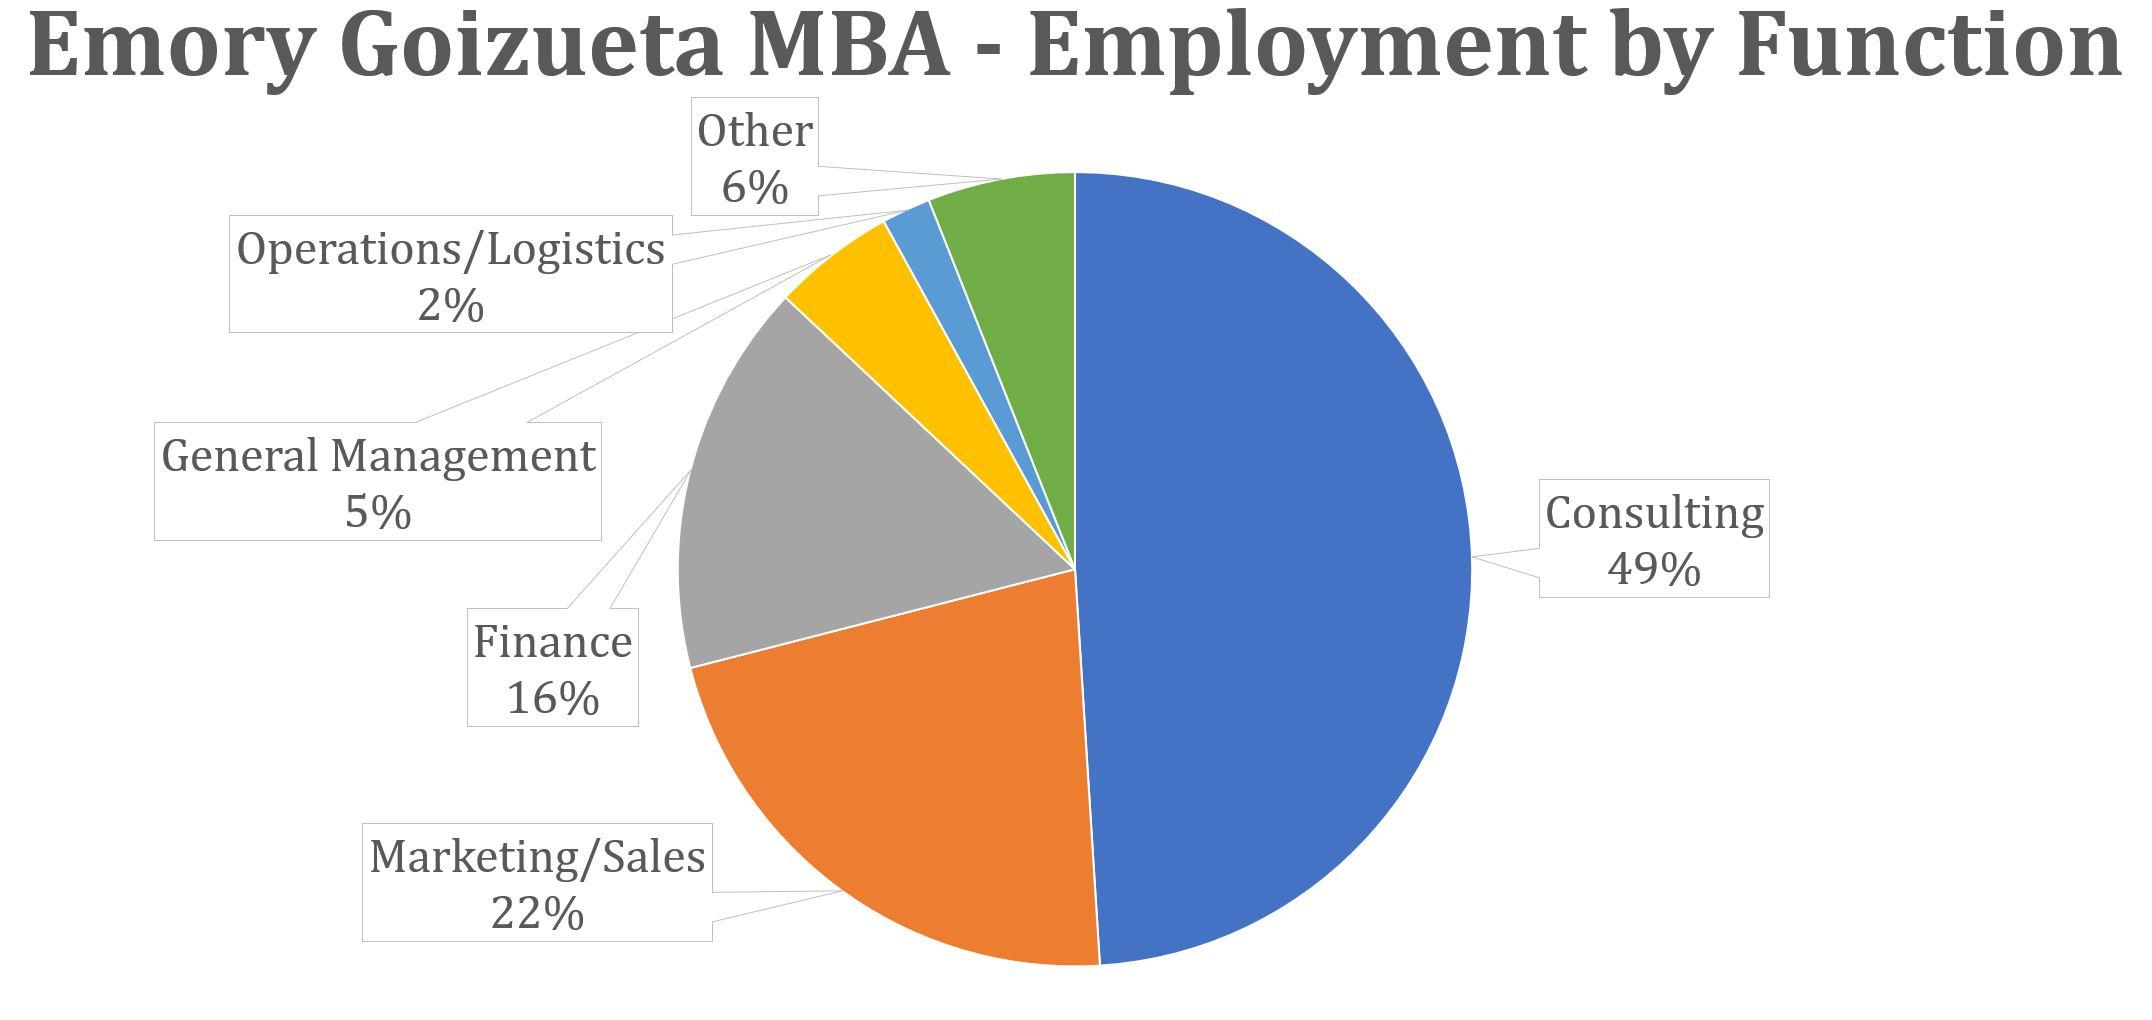 Emory Goizueta MBA - Employment by Function